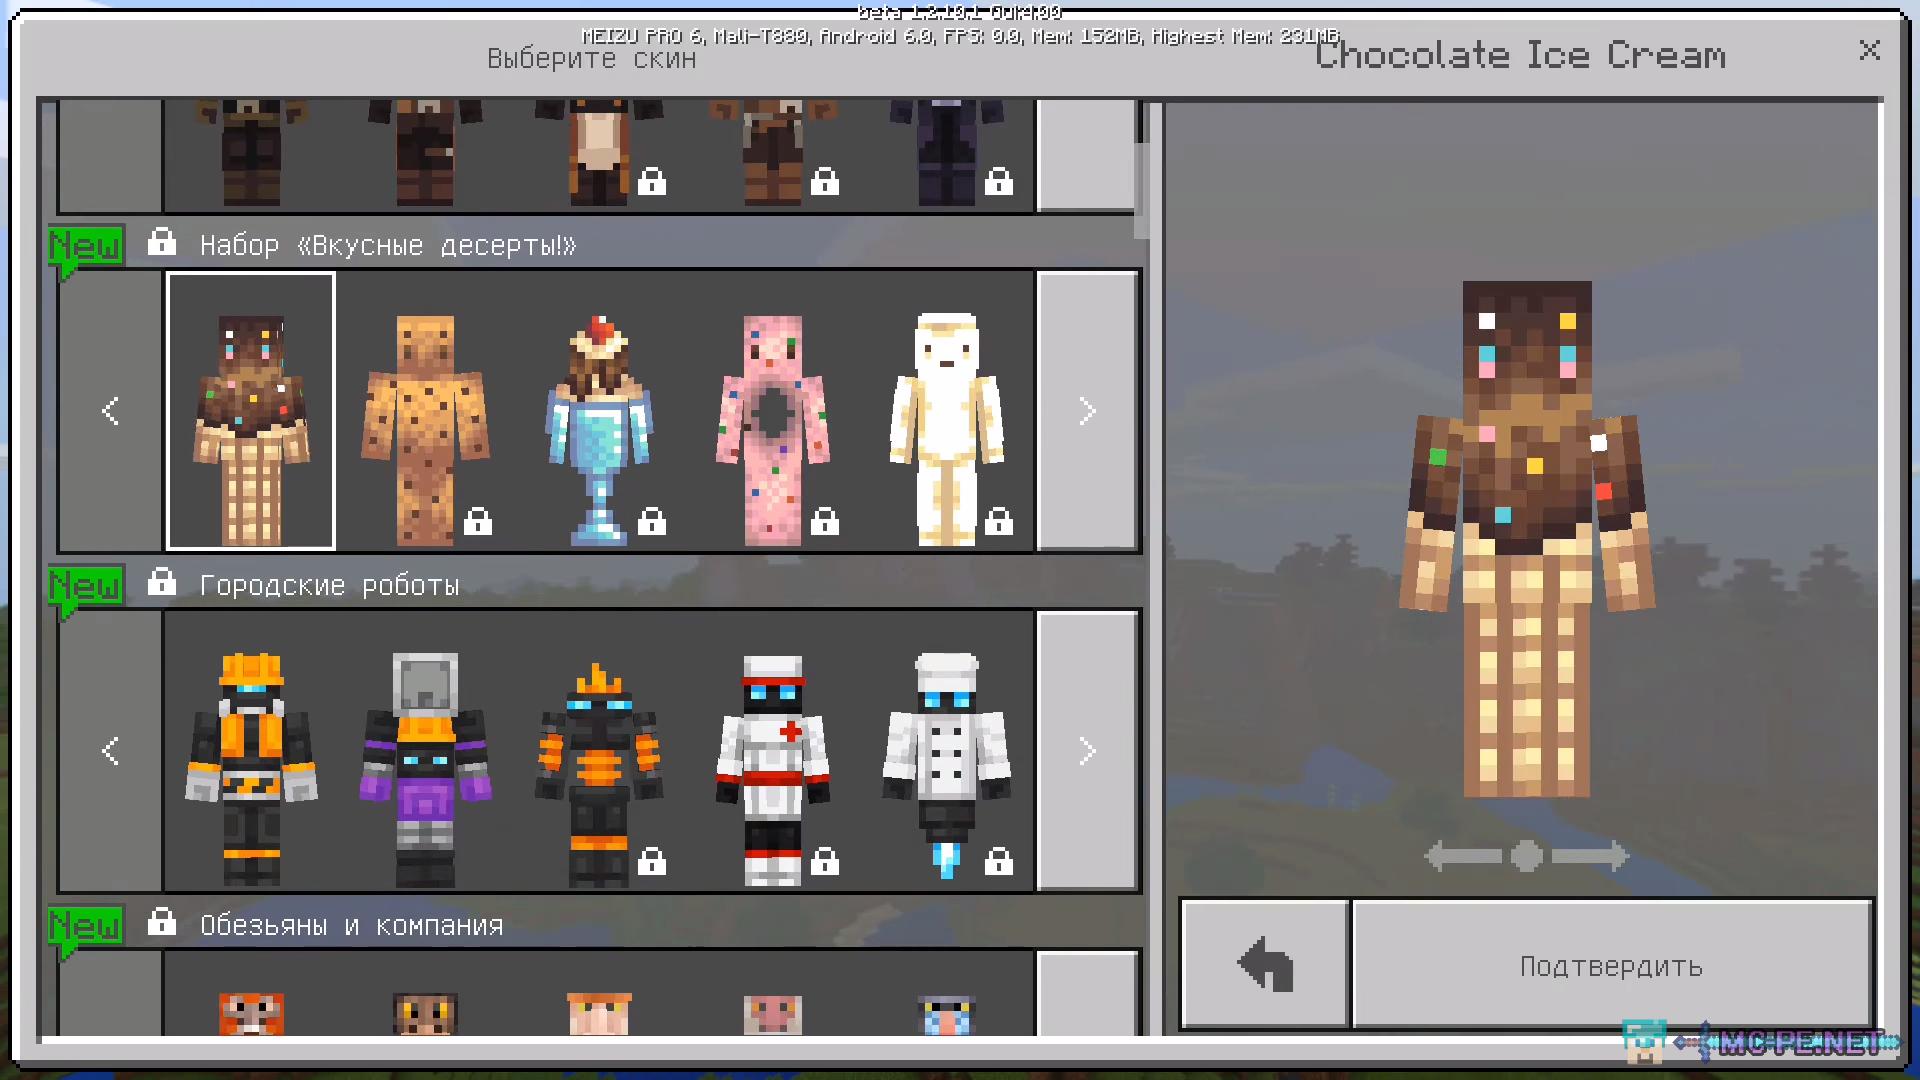 minecraft pe windows 10 apk download